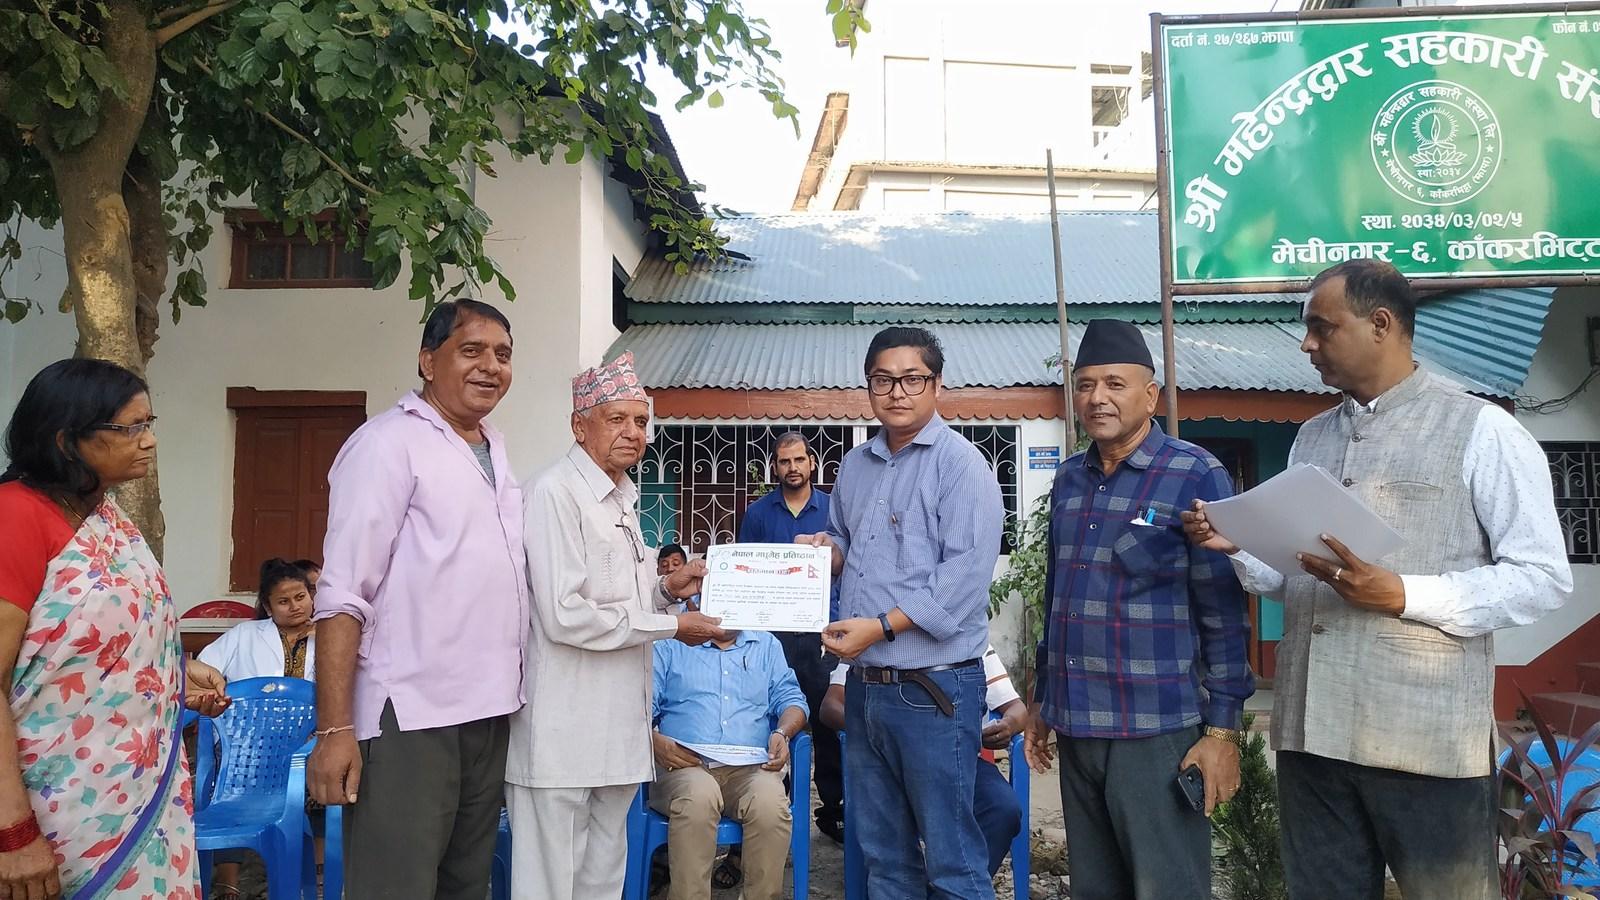 Diabetes Eye Screening Health Camp On 29th World Diabetes Day Rotary Club Of Kakarvitta 5